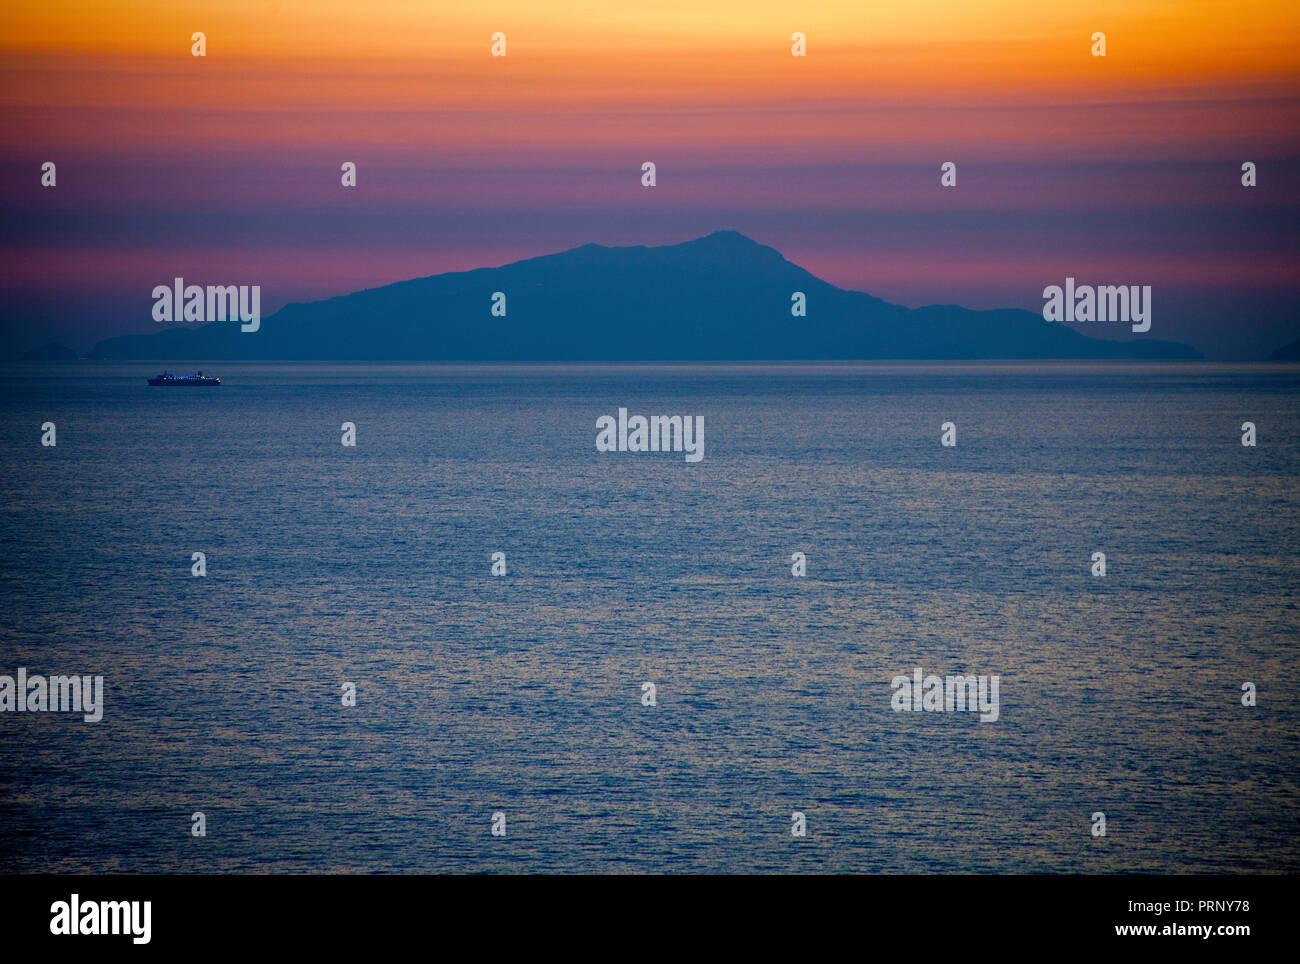 Sonnenuntergang bei der Insel Capri, Golf von Neapel, Kampanien, Italien | Capri island at sunset, Gulf of Naples, Campania, Italy - Stock Image